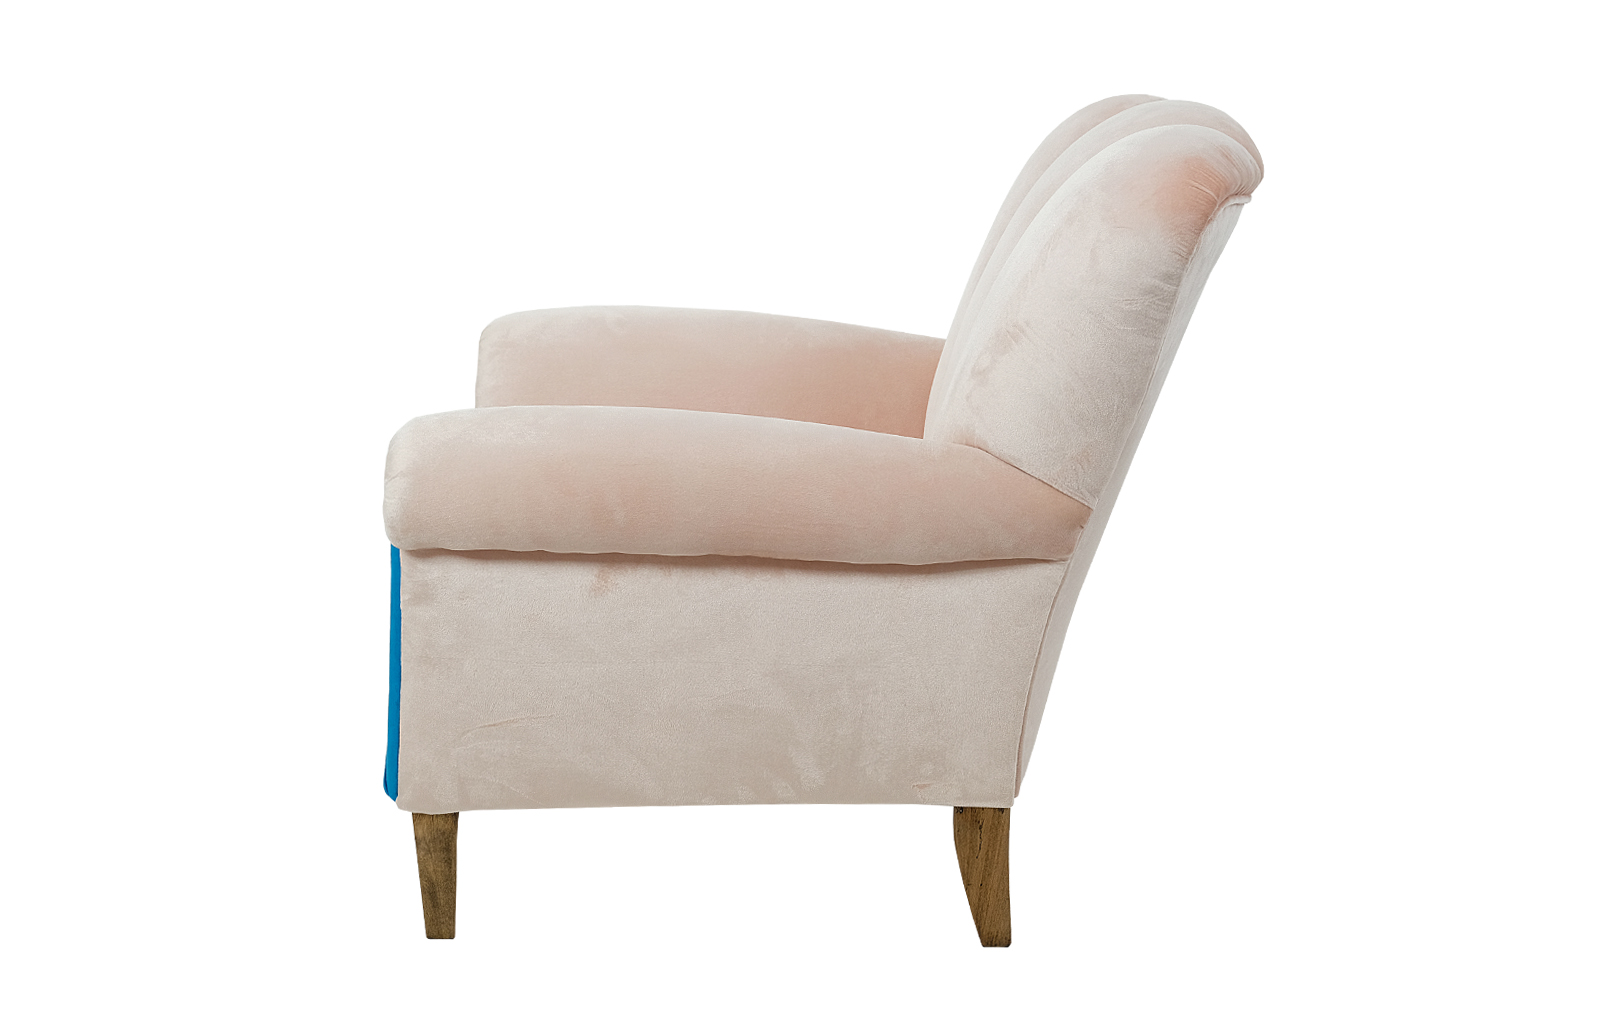 fotel klubowy, fotel muszelka, fotel uszak, fotel prl